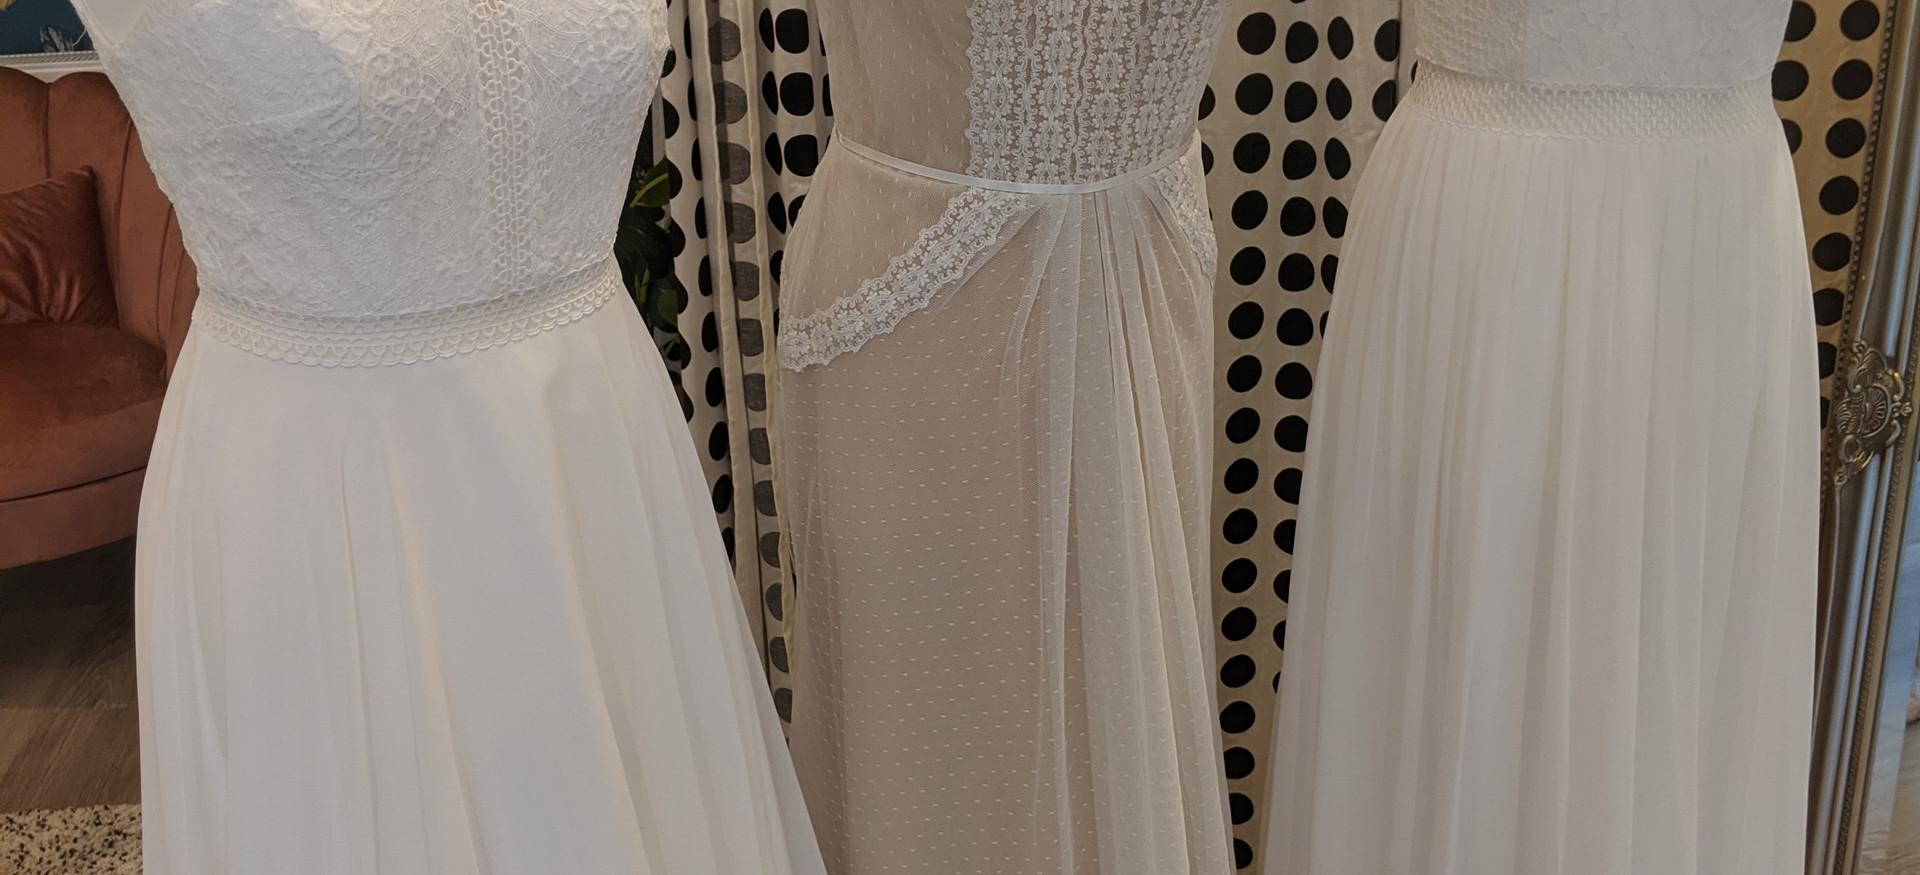 Off the Peg Wedding dresses at Pretty Smithy Bridal